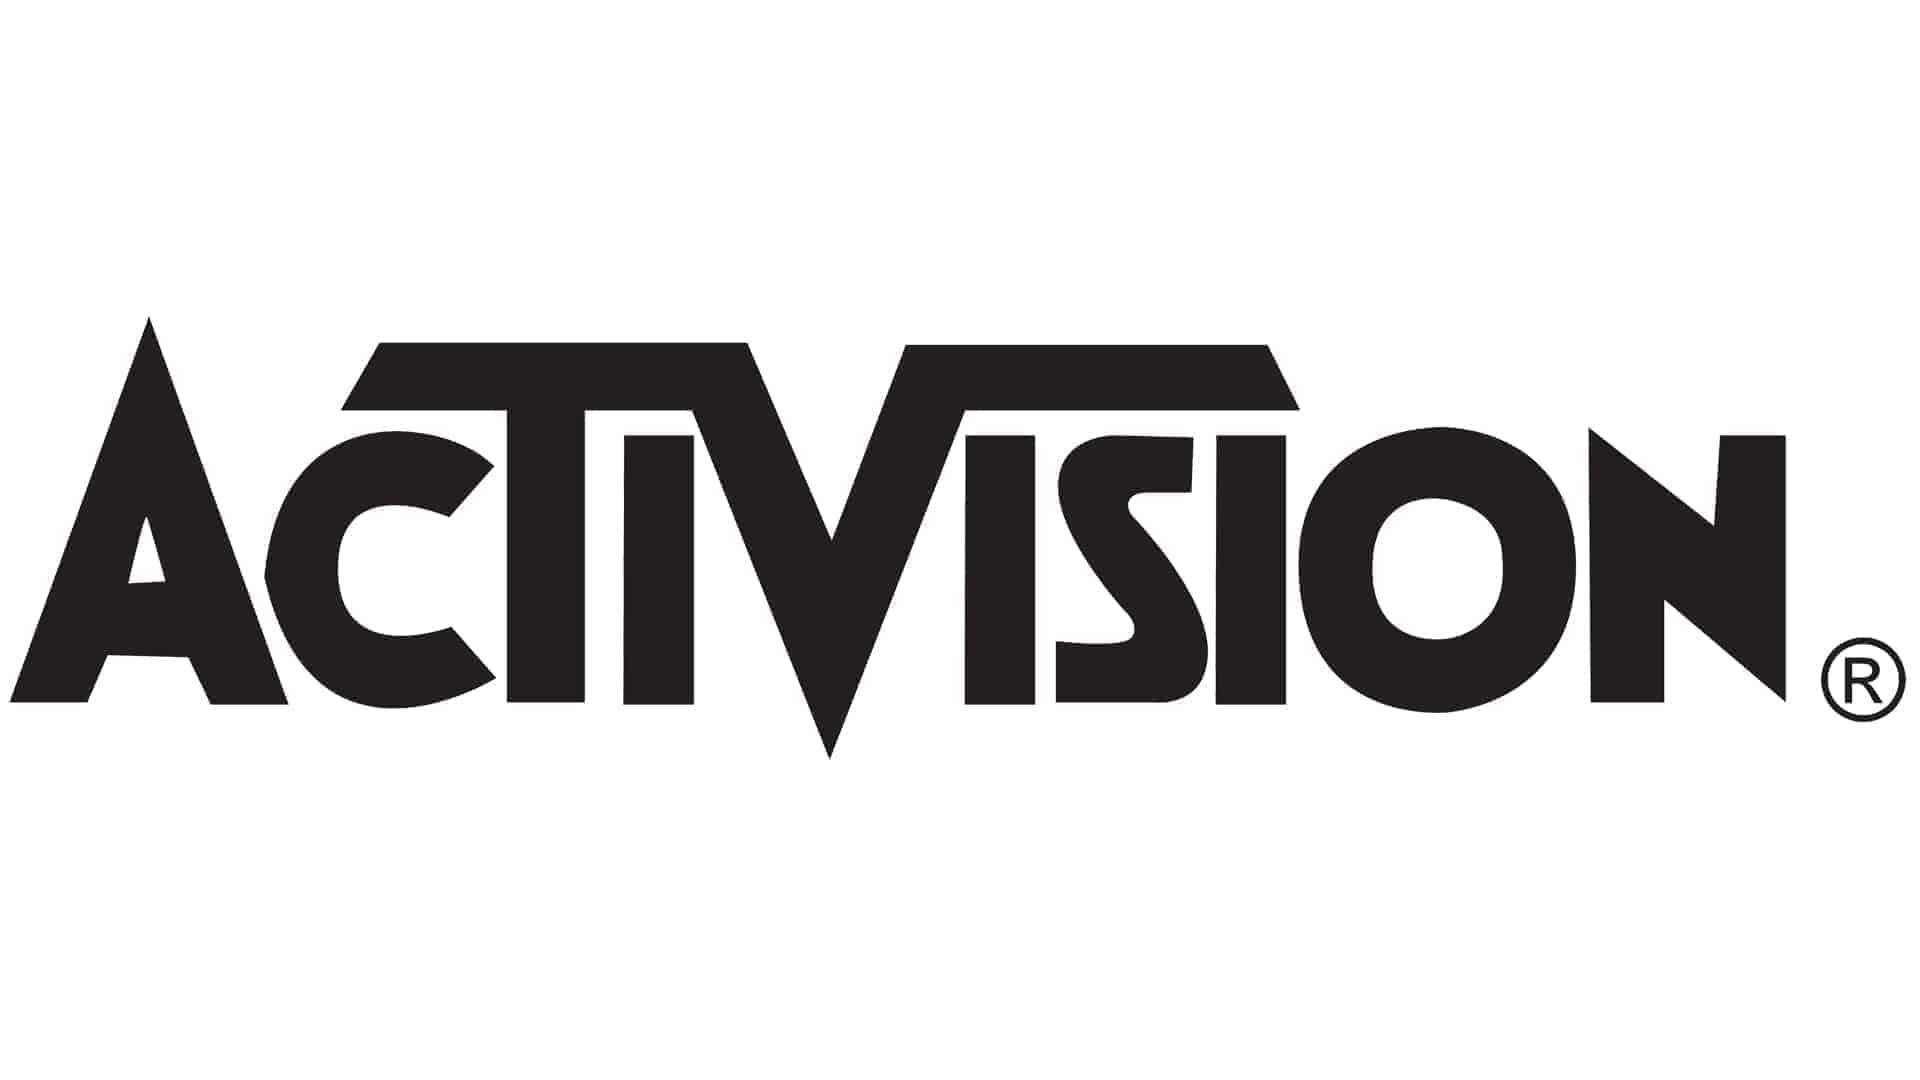 Activision Black on White logo